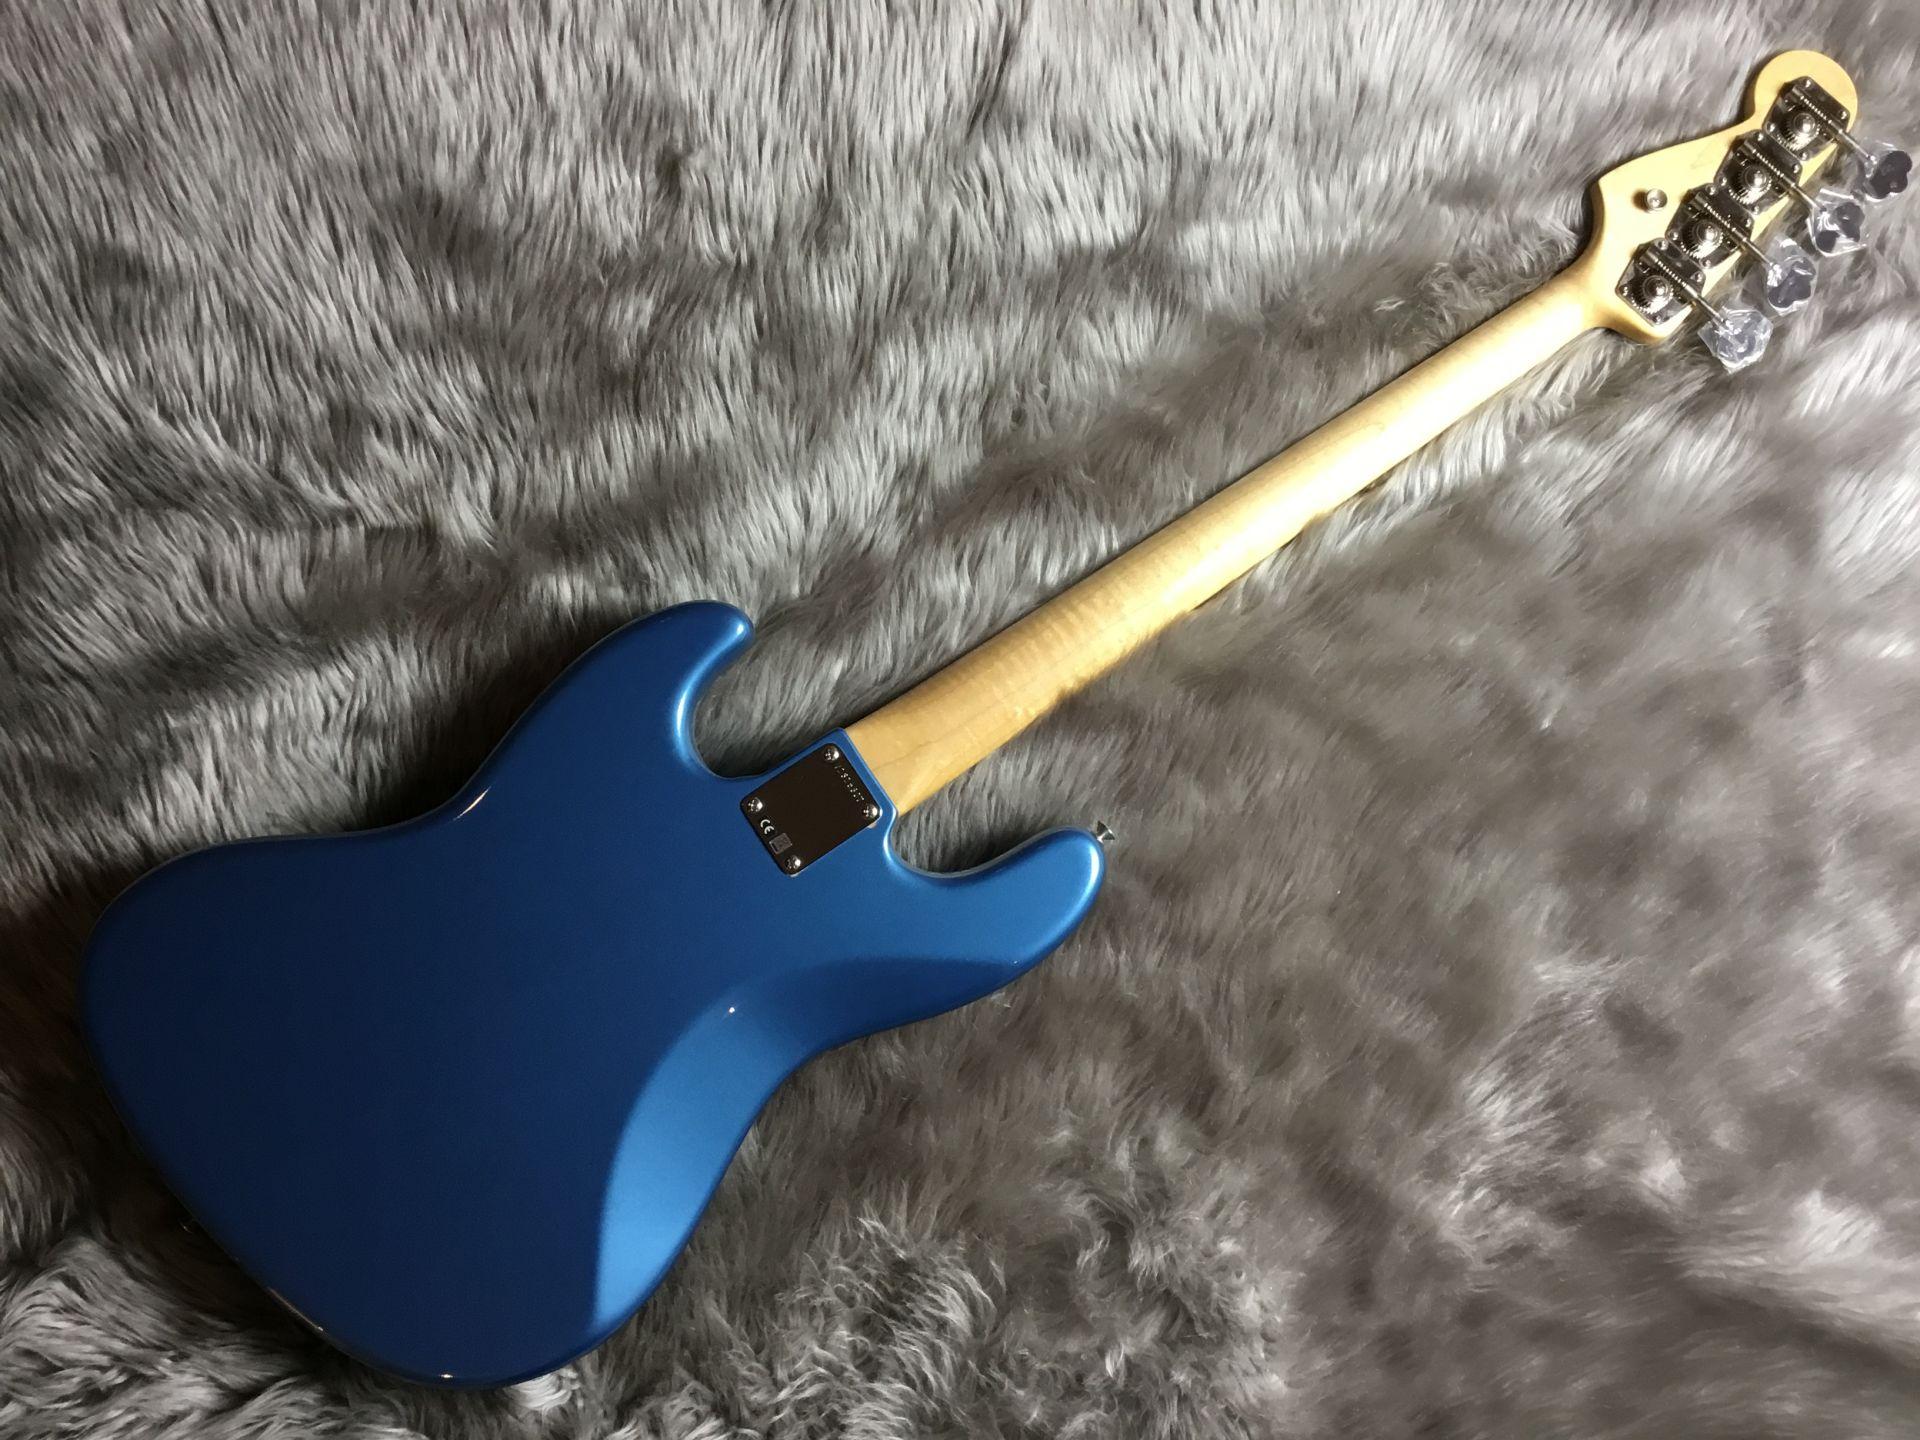 American Vintage '64 Jazz Bassのヘッド画像